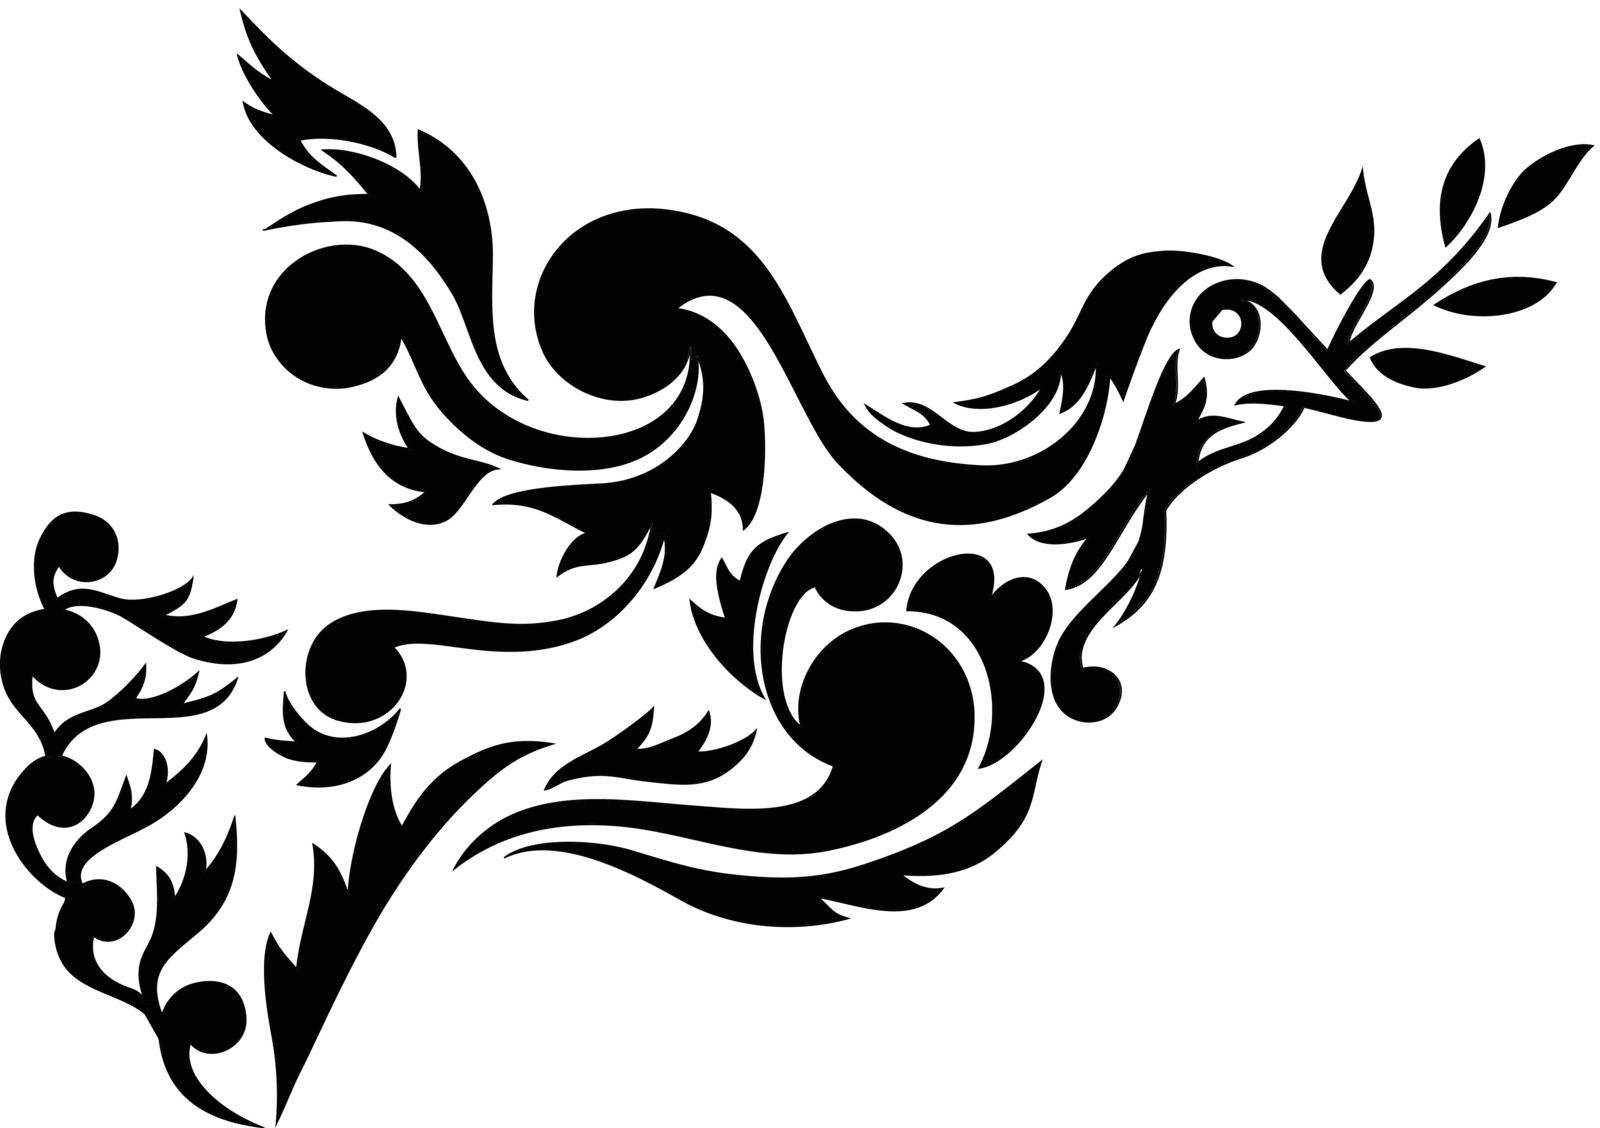 Dove flying floral ornament, art vector decoration